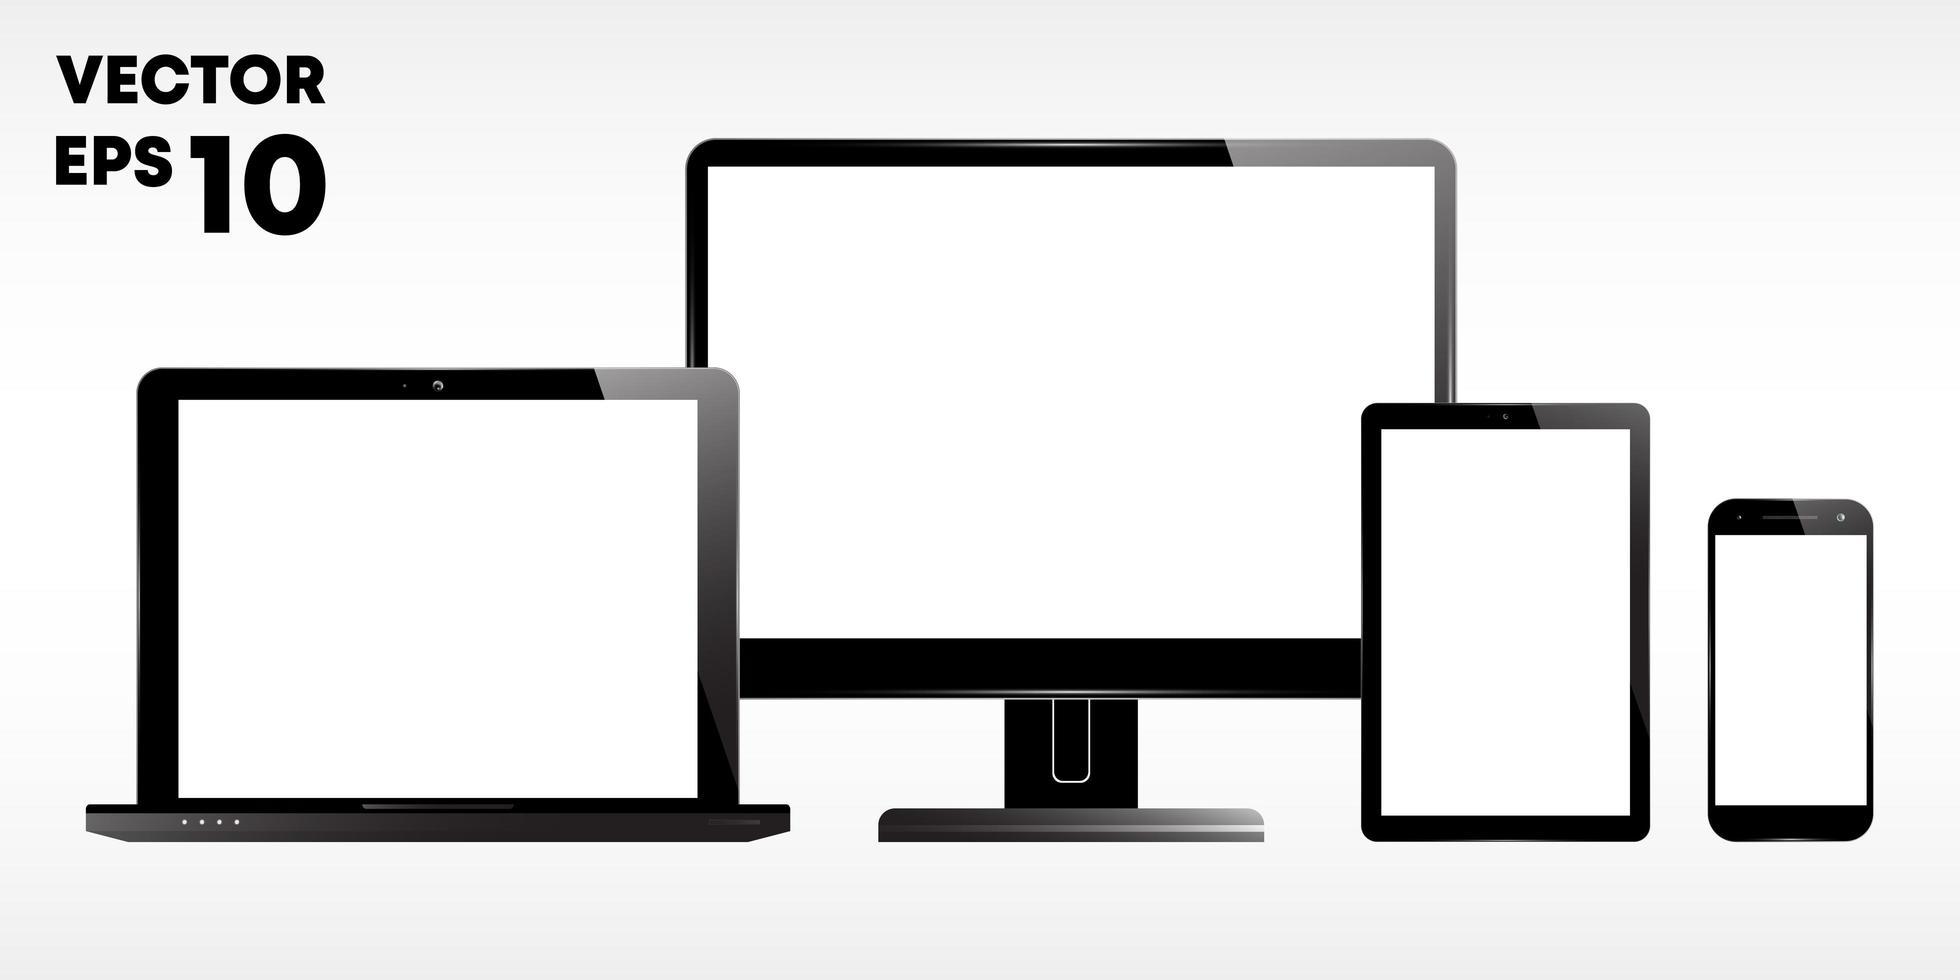 computadora portátil, monitor de computadora, pantalla, tableta y teléfono inteligente vector